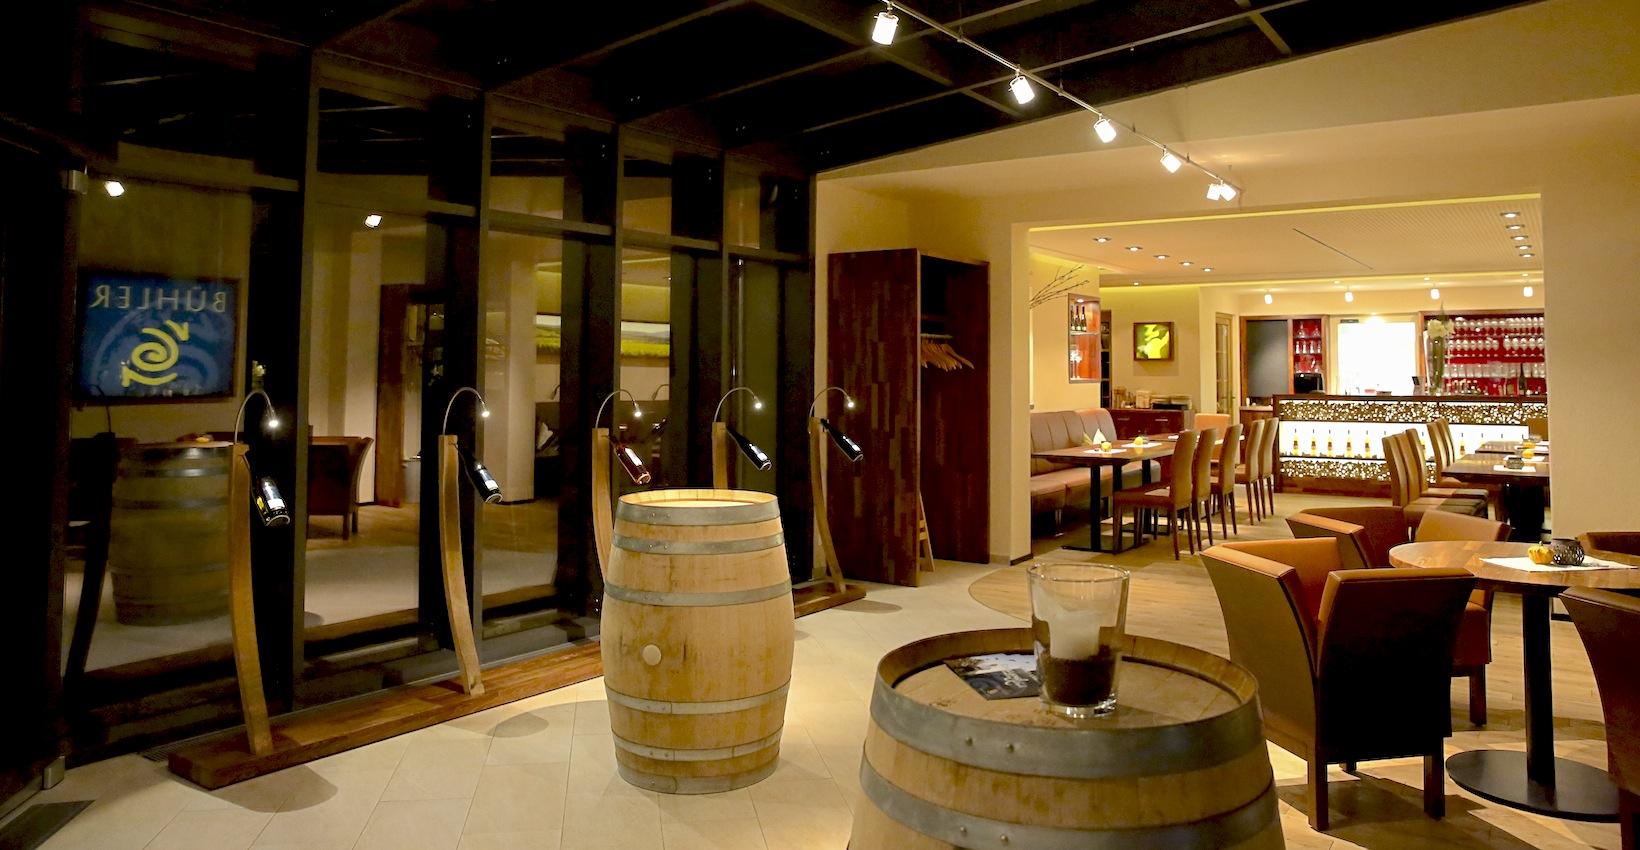 Landhaus_Bühler_Foyer.JPG